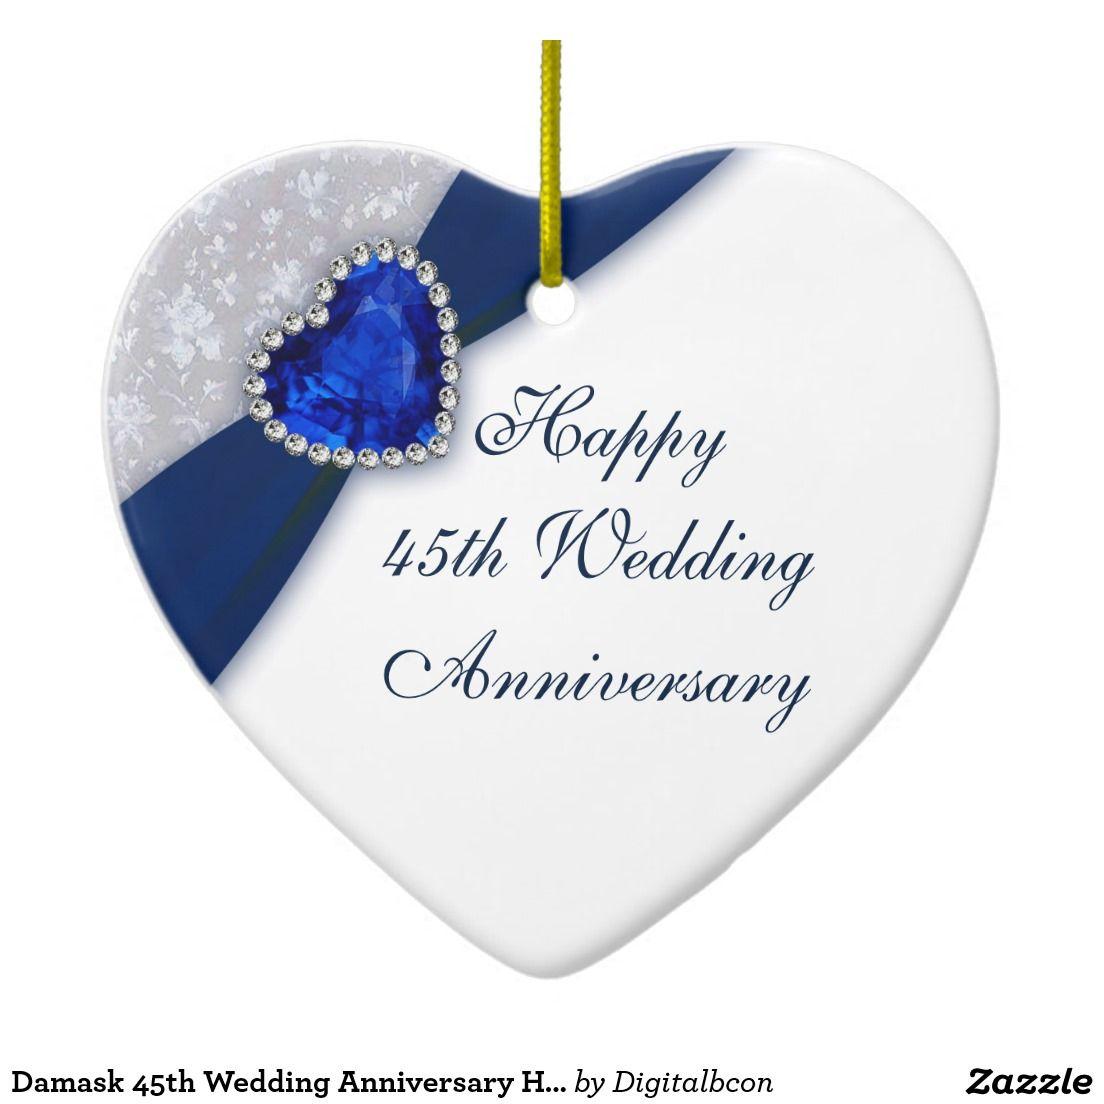 Damask 45th Wedding Anniversary Heart Ornament